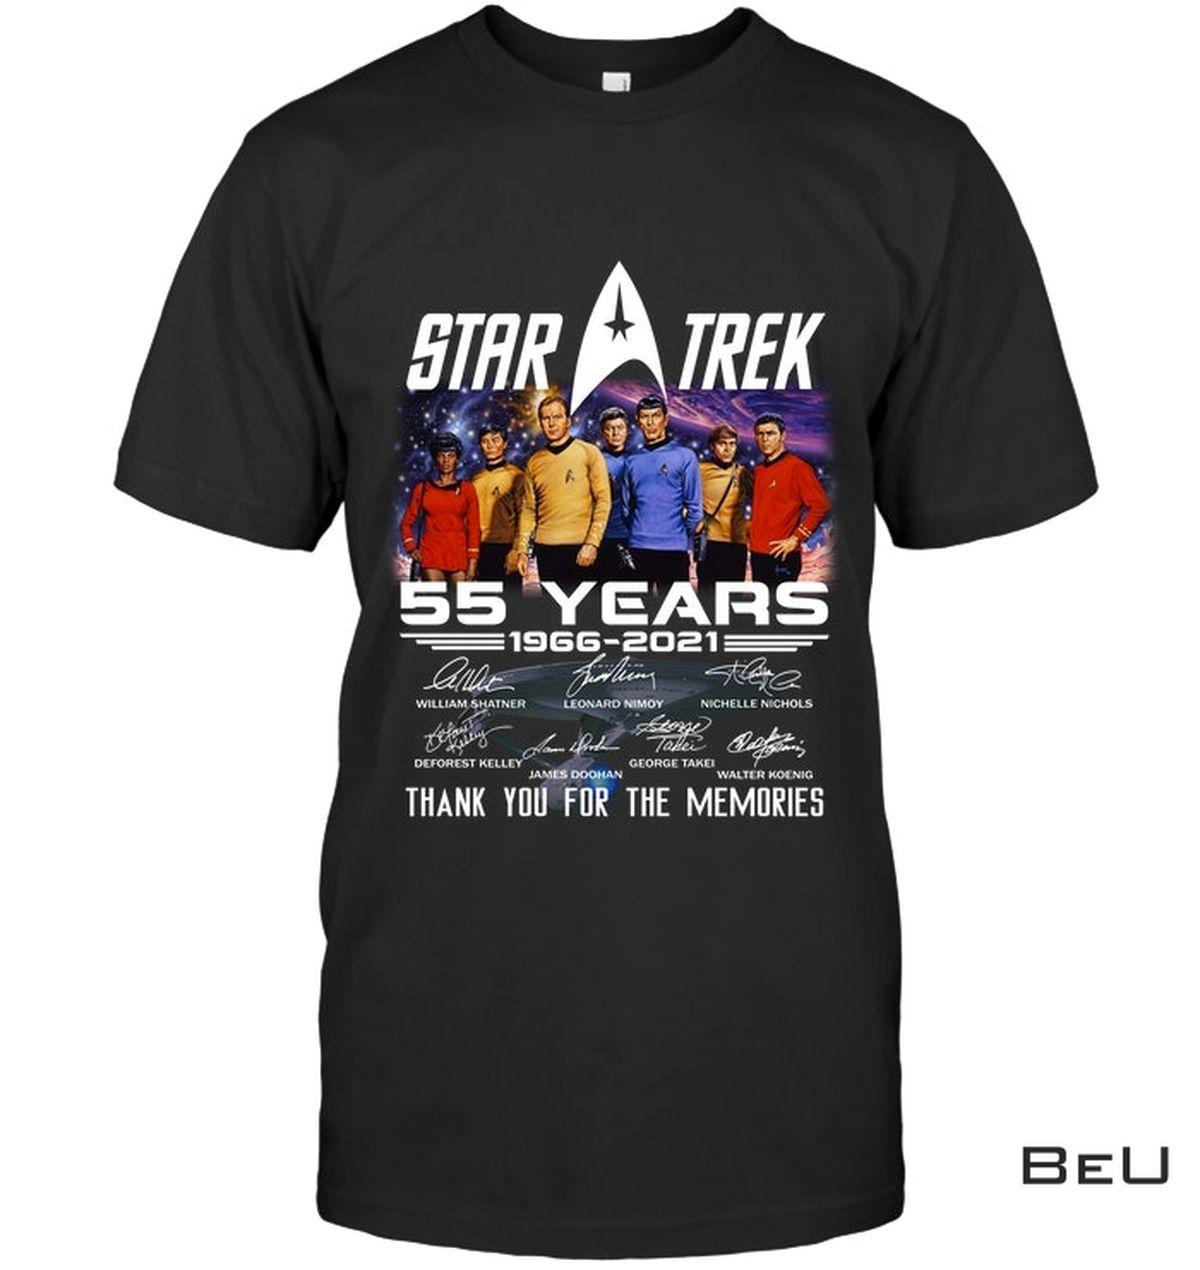 Star Trek 55th Anniversary Thank You For The Memories Shirt, hoodie, tank top